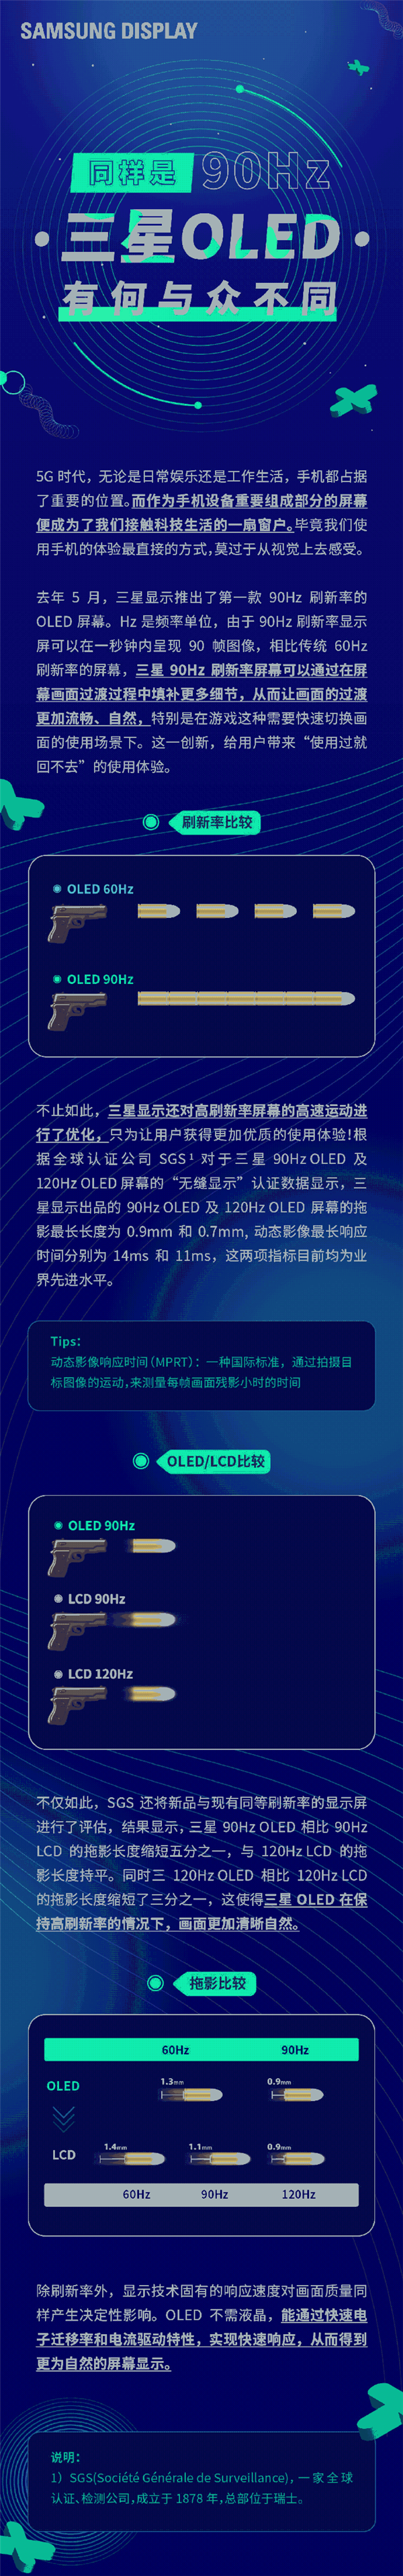 三星科普:90Hz OLED相当于120Hz LCD